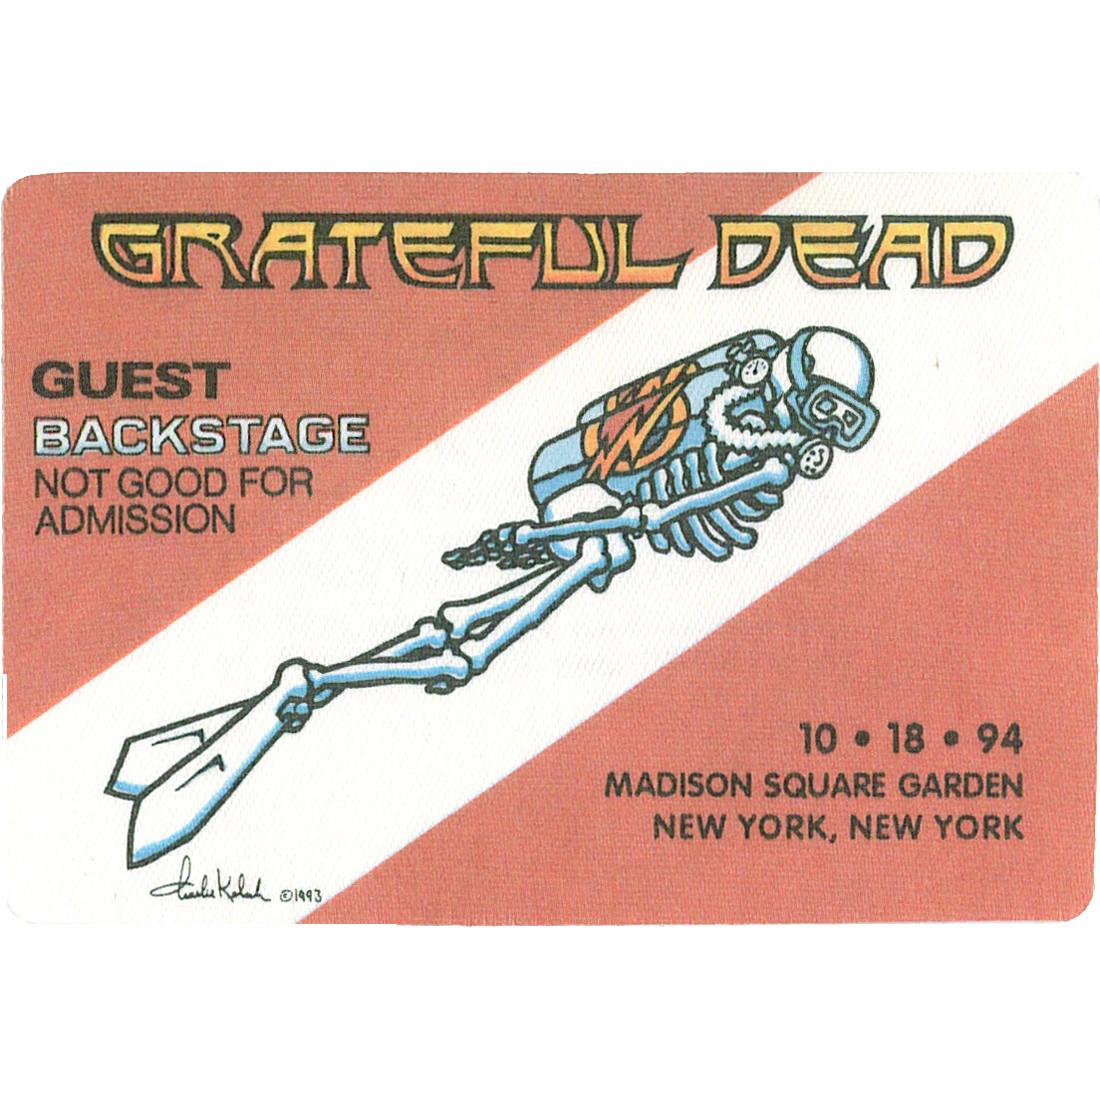 Grateful Dead 1994 10-18 Backstage Pass